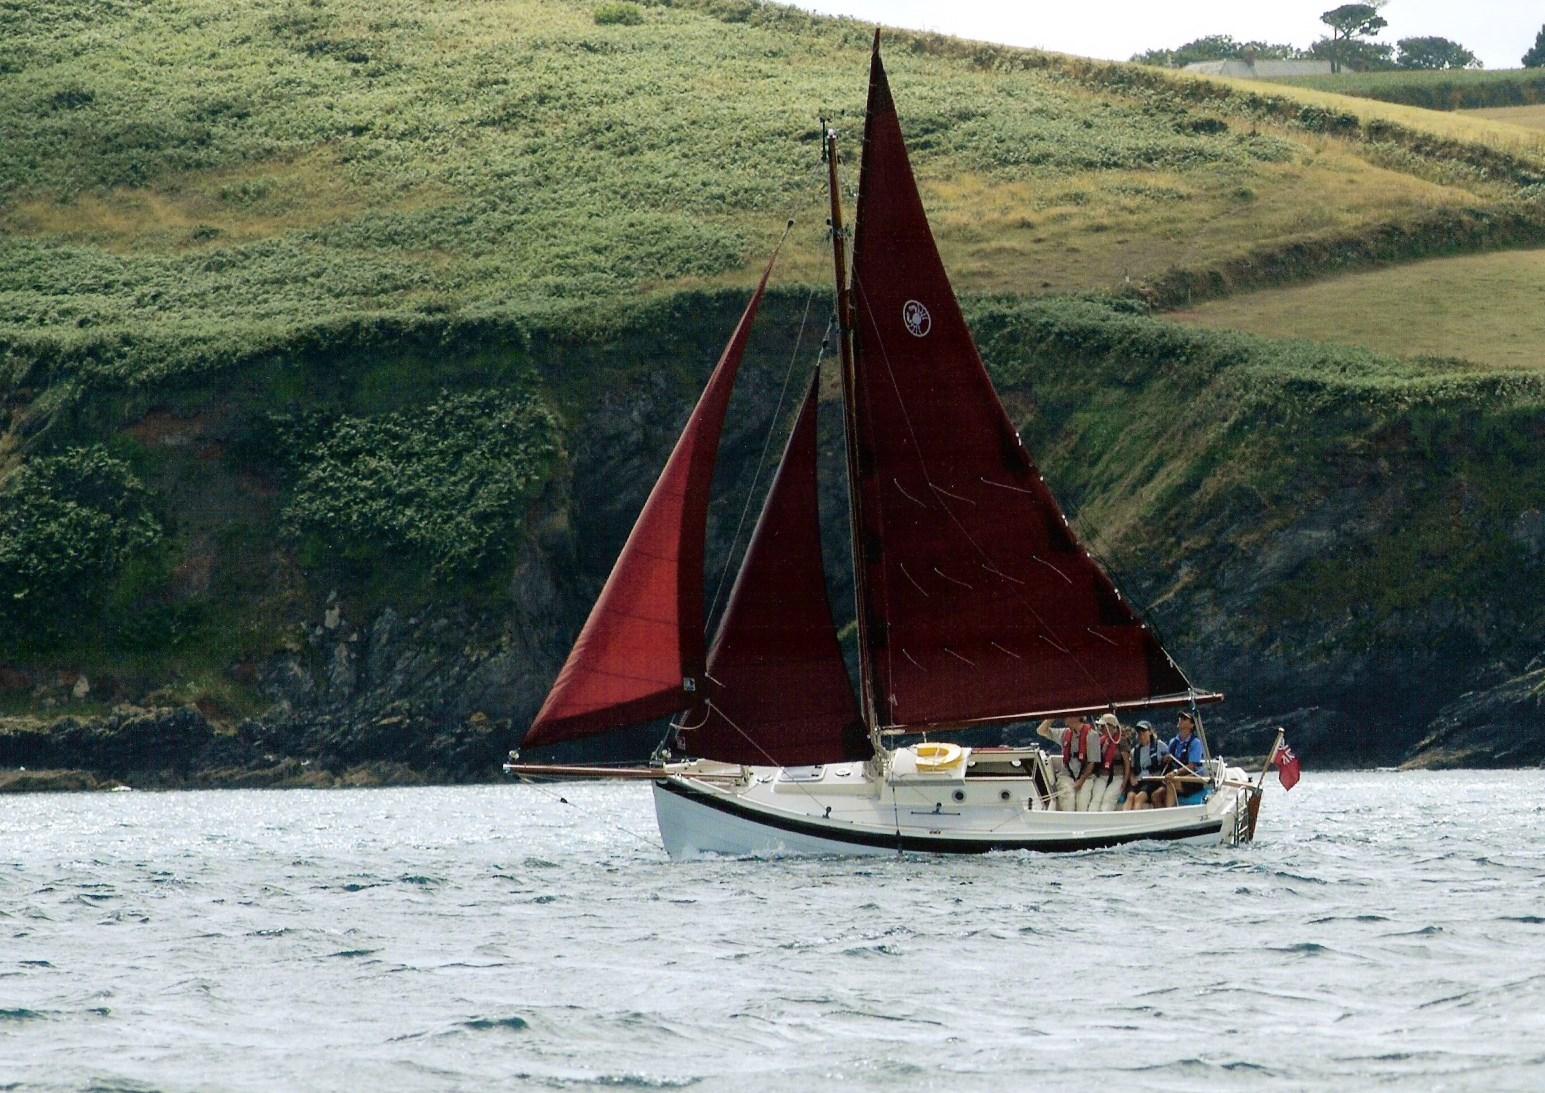 Cornish Crabber 22 Cornish Crabber 22 for sale